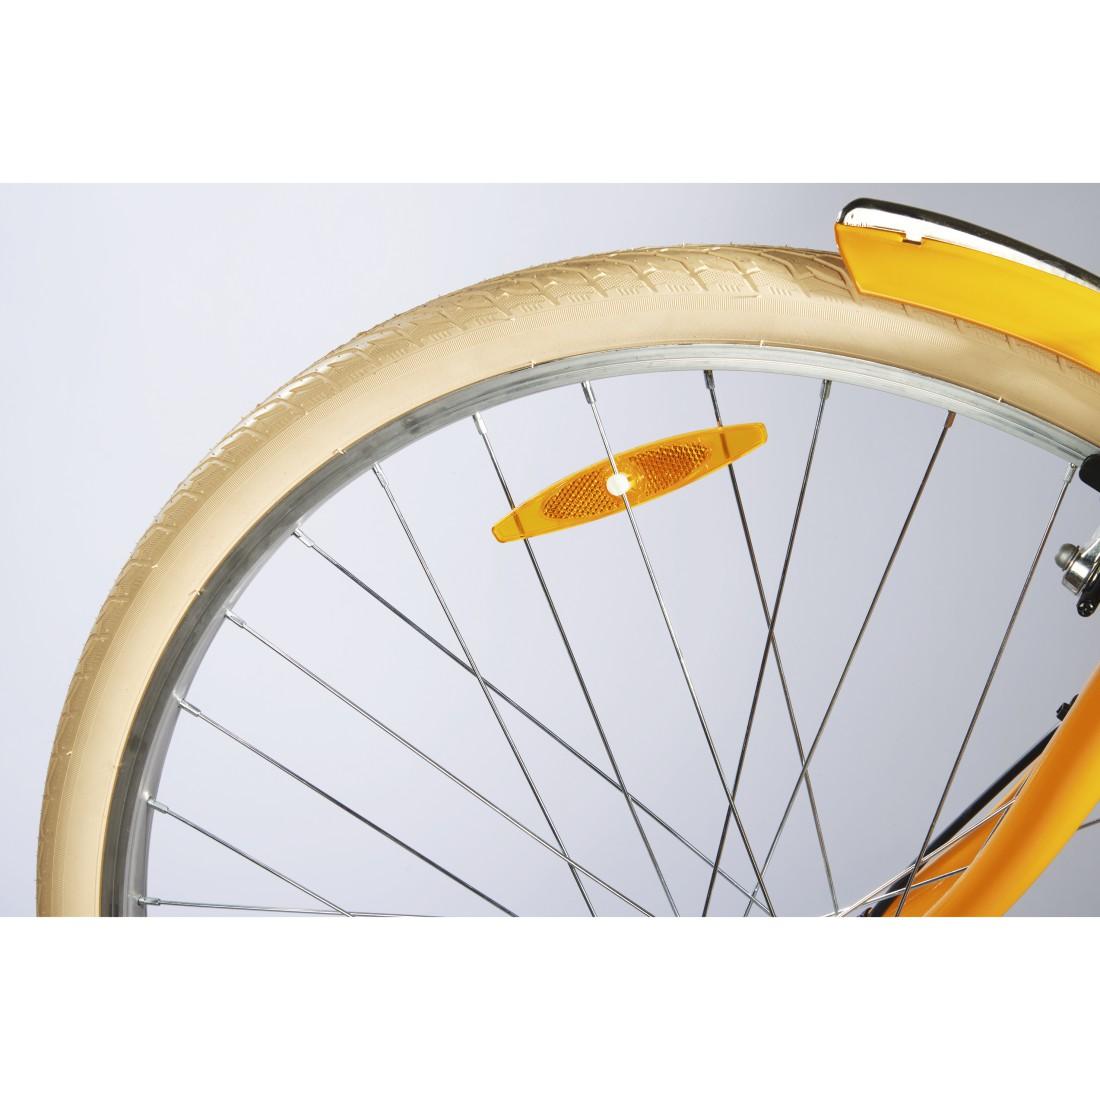 Hama 178125 Fahrrad-Speichenreflektoren 4 Stück